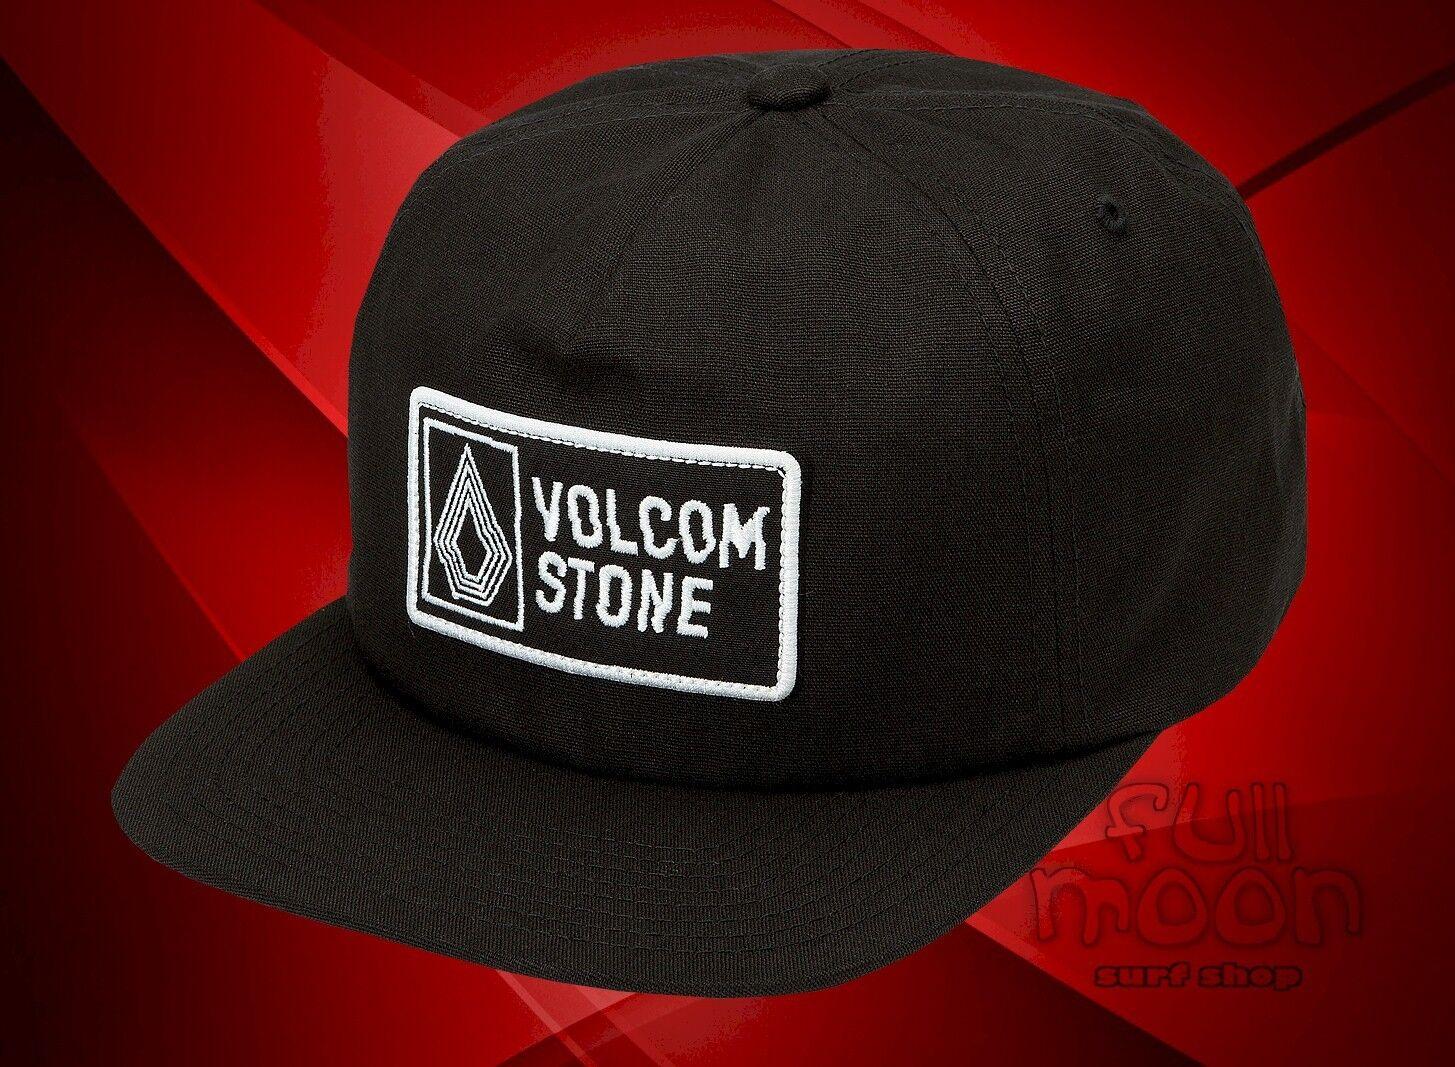 New Volcom Hat Bender Mens Snapback Cap Hat Volcom fc01f0